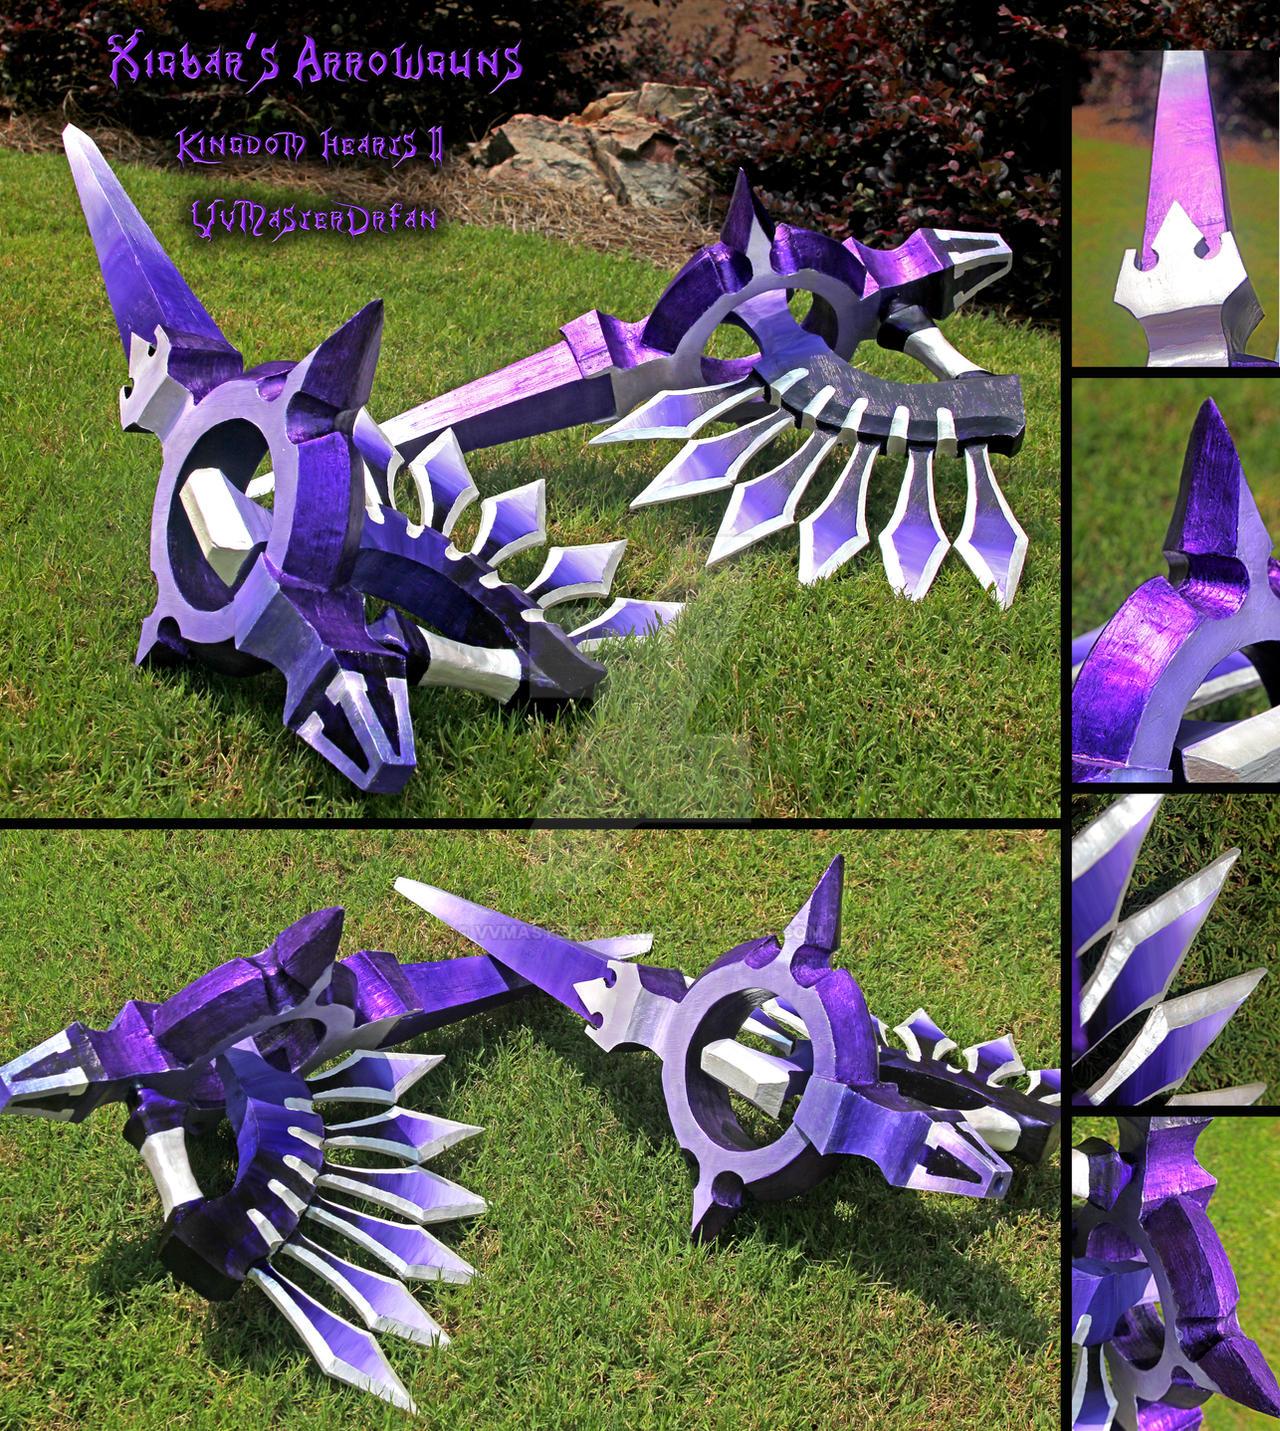 Xigbar's Arrowguns by vvmasterdrfan